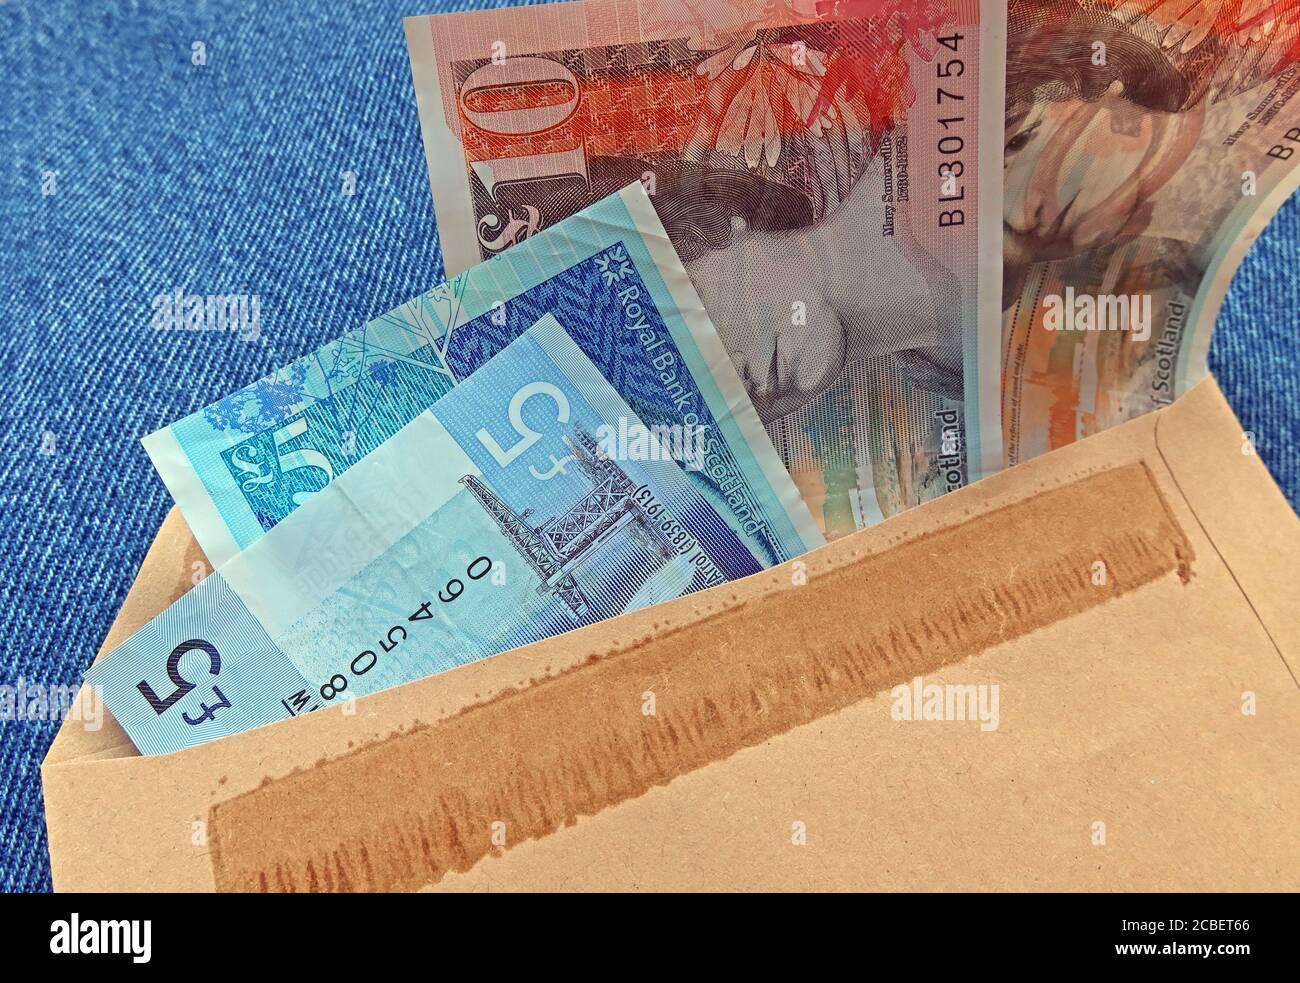 HotpixUK,@HotpixUK,GoTonySmith,Warrington,Cheshire,England,UK,note,notes,cash,sterling,currency,5 pound,10 pound,20 pound,cash money,economy,bribe,inducement,commission,payment,black economy,back hander,backhander,envelope,brown envelope,British,Great Britain,hard currency,legal tender